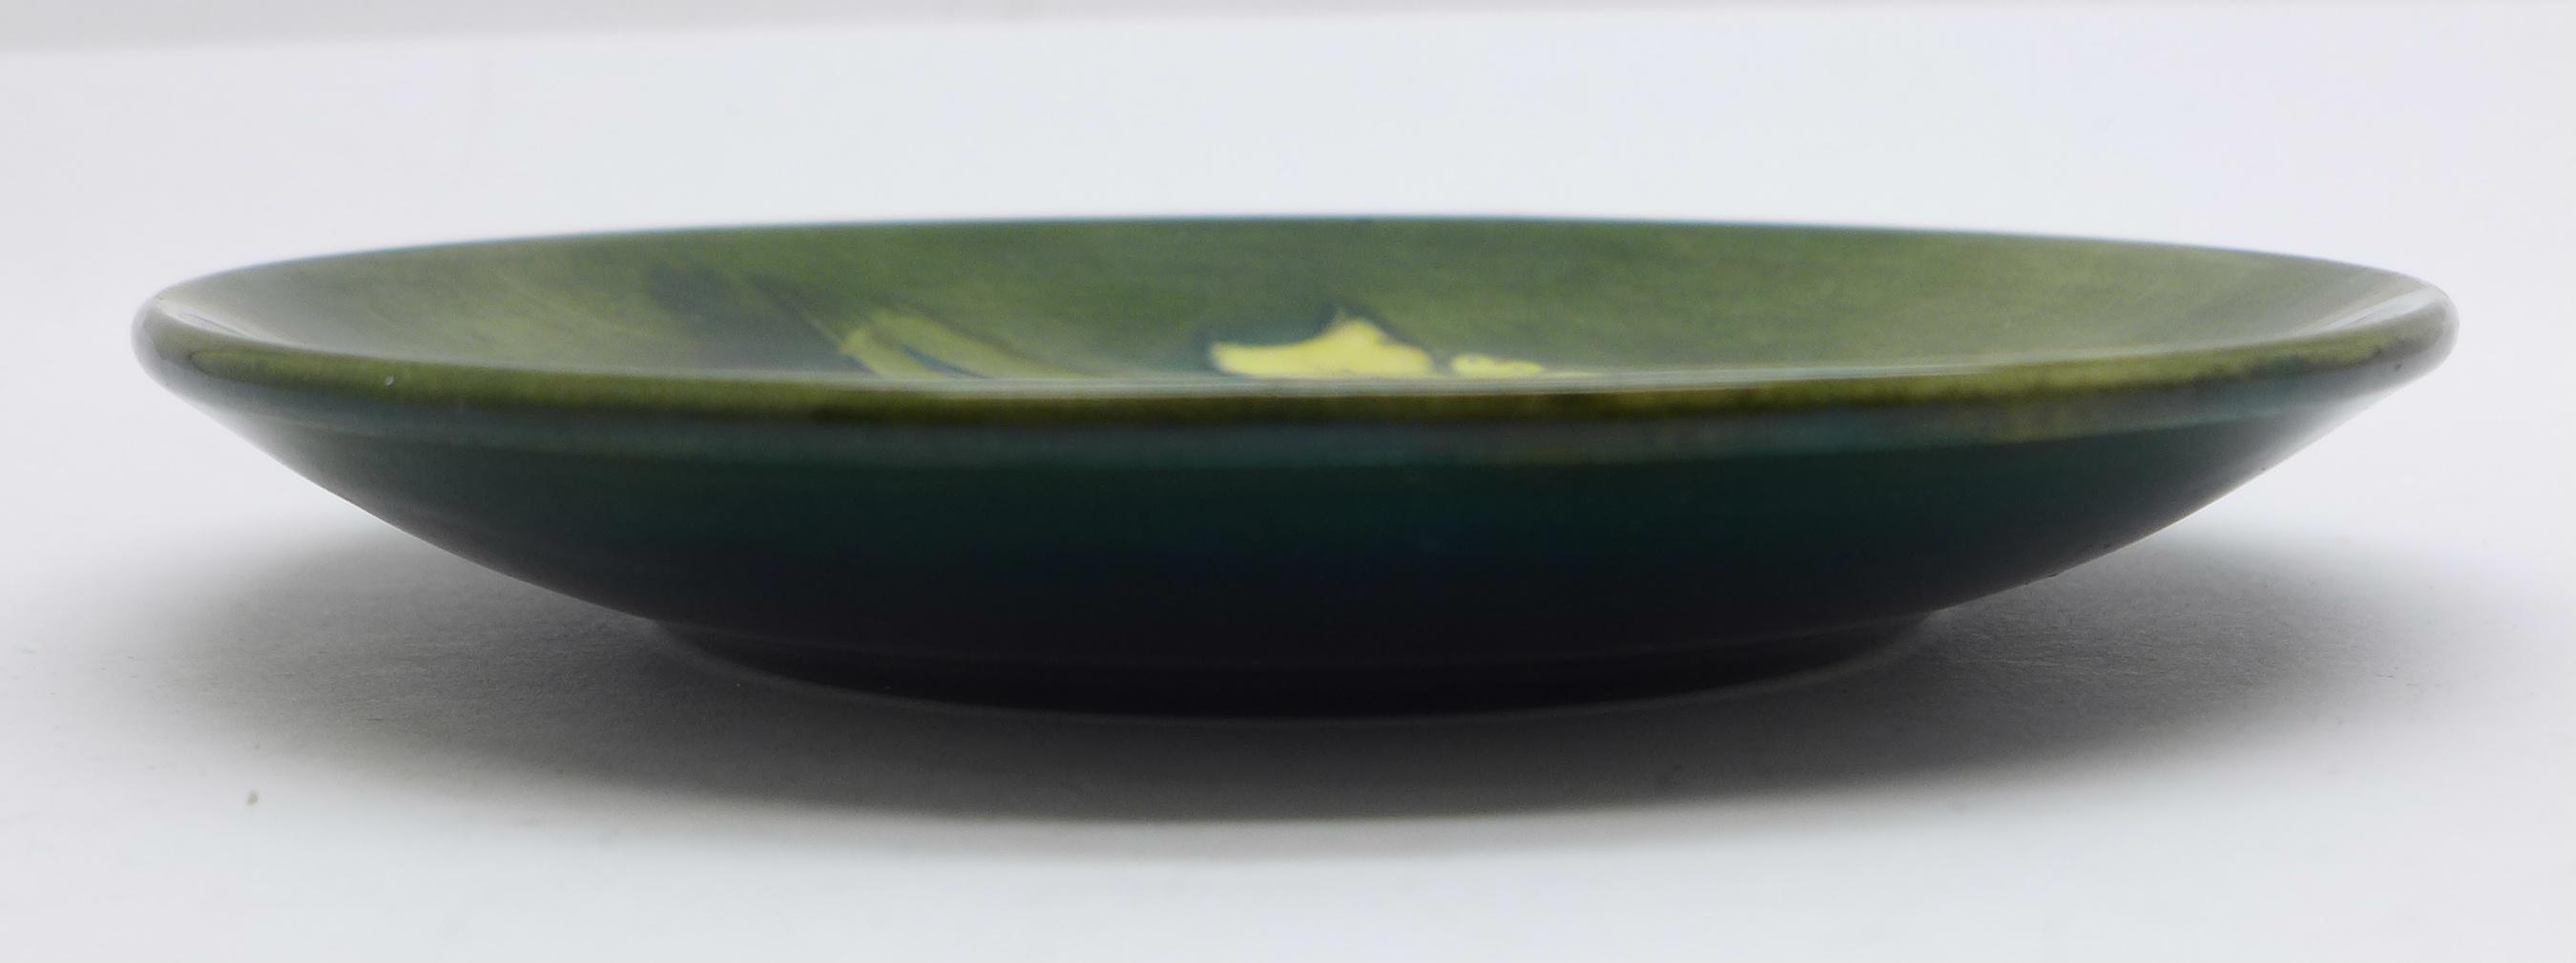 A Moorcroft dish, 11.5cm diameter - Image 3 of 4